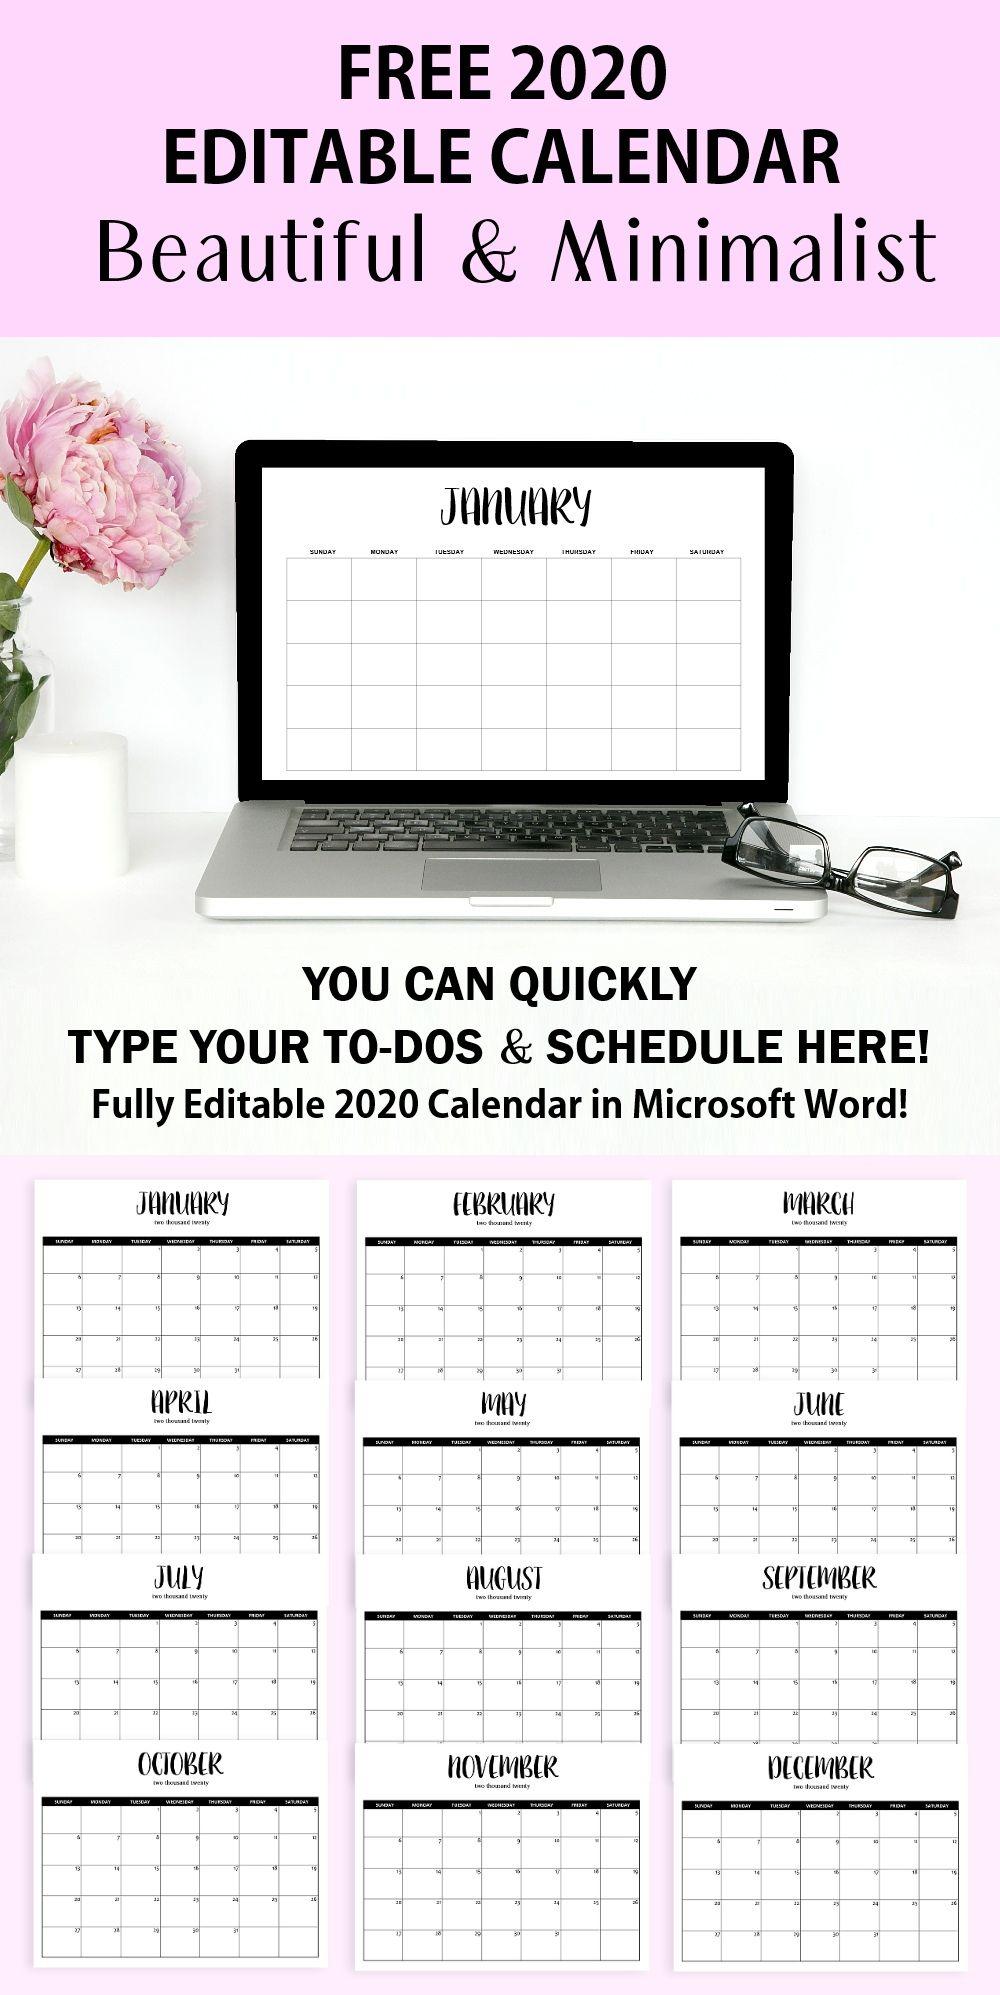 Free Fully Editable 2020 Calendar Template In Word Editable